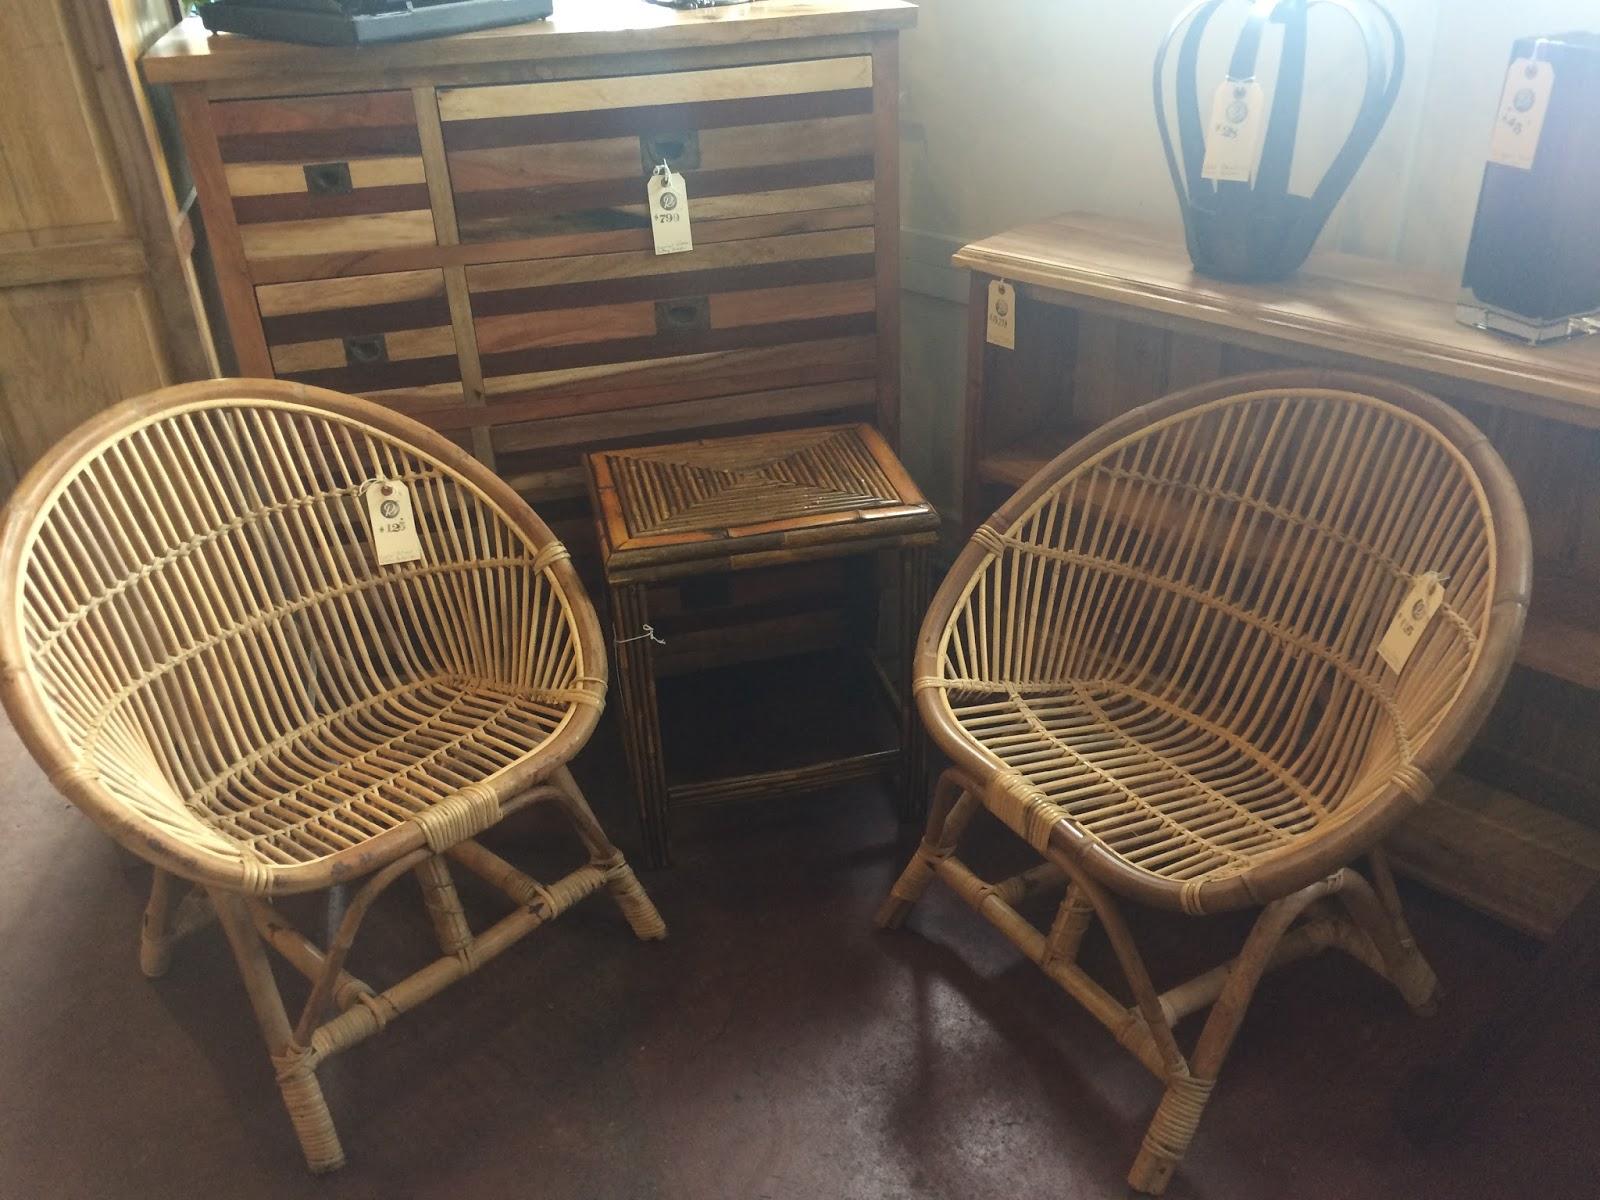 Rattan Bucket Chairs $125 Each